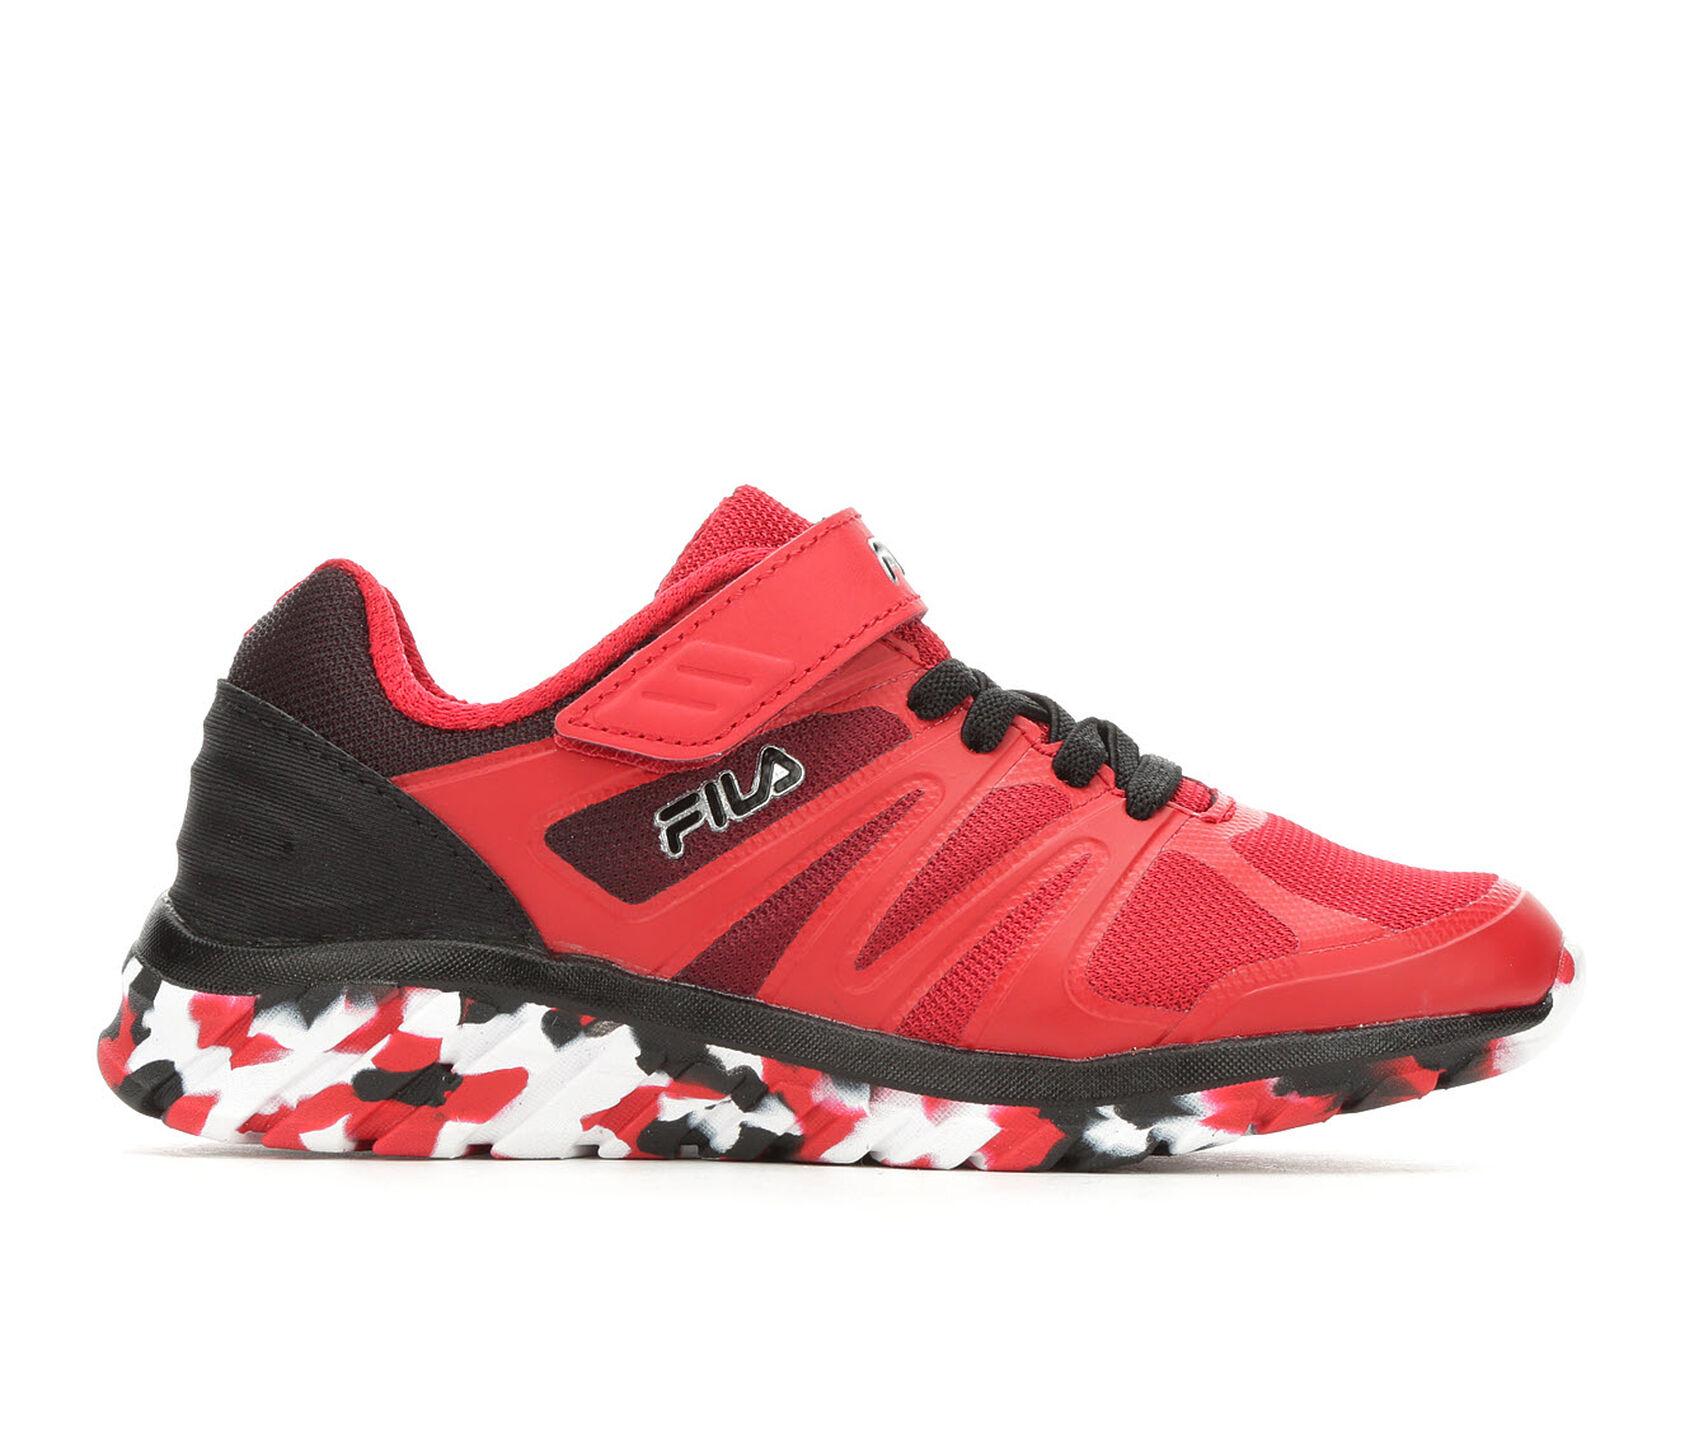 529b88020a8 Boys' Fila Little Kid & Big Kid Cryptonic 3 Strap Running Shoes ...